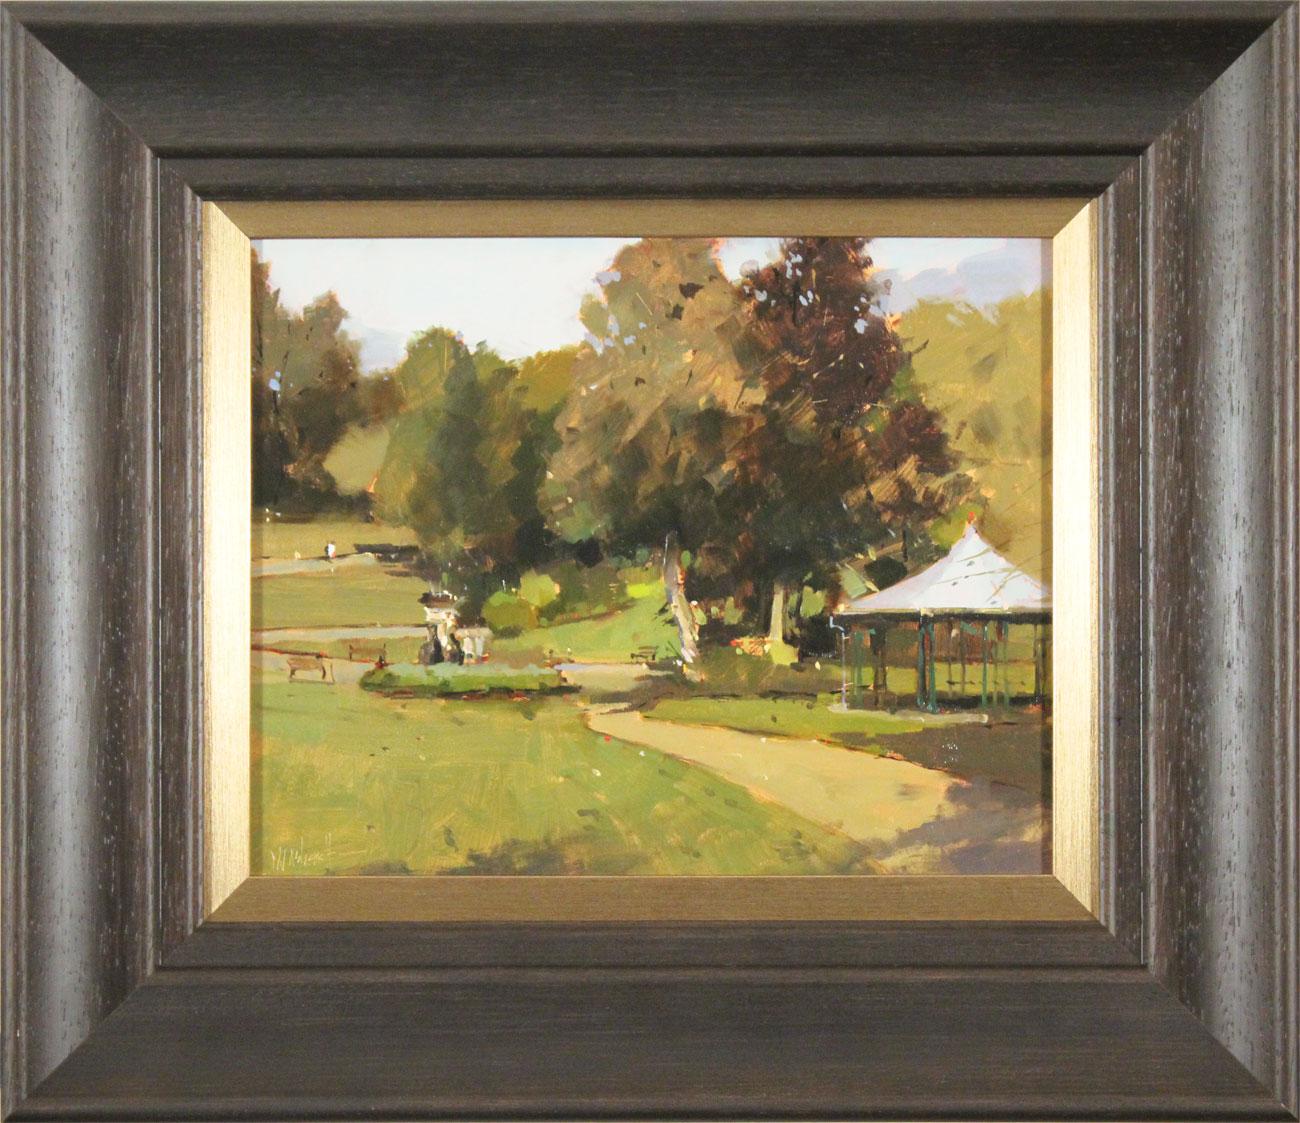 Michael John Ashcroft, AROI, Original oil painting on panel, Parklife  Click to enlarge